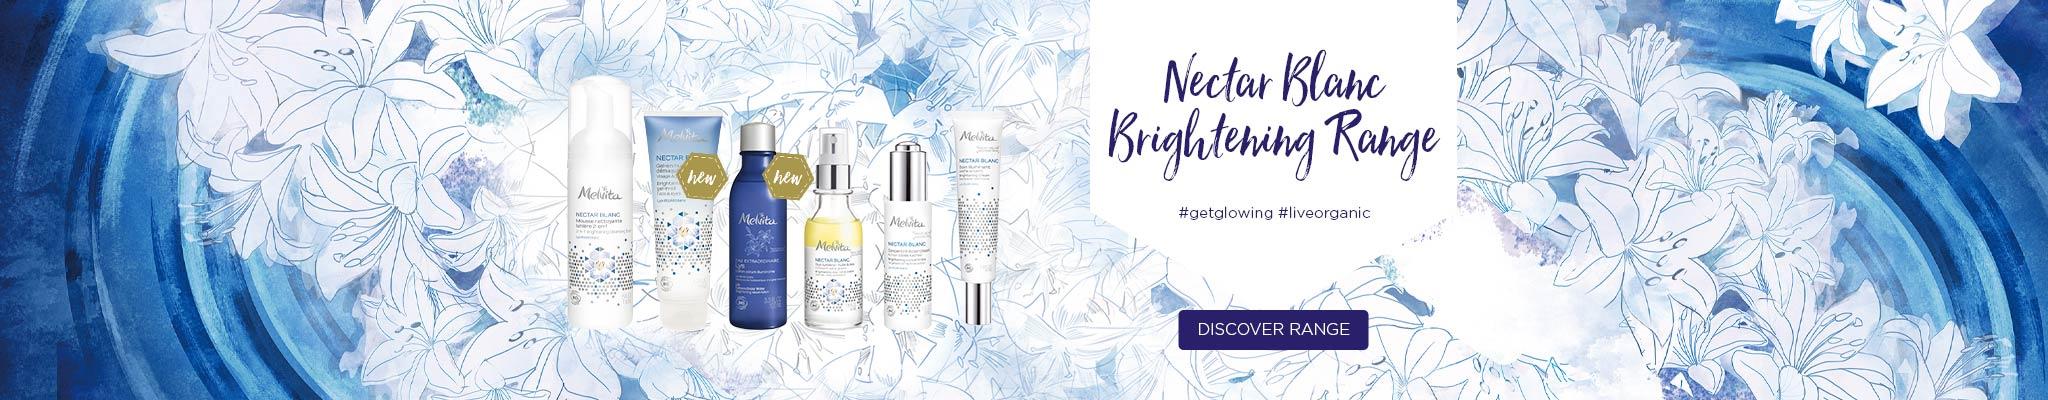 Nectar Blanc Brightening Range